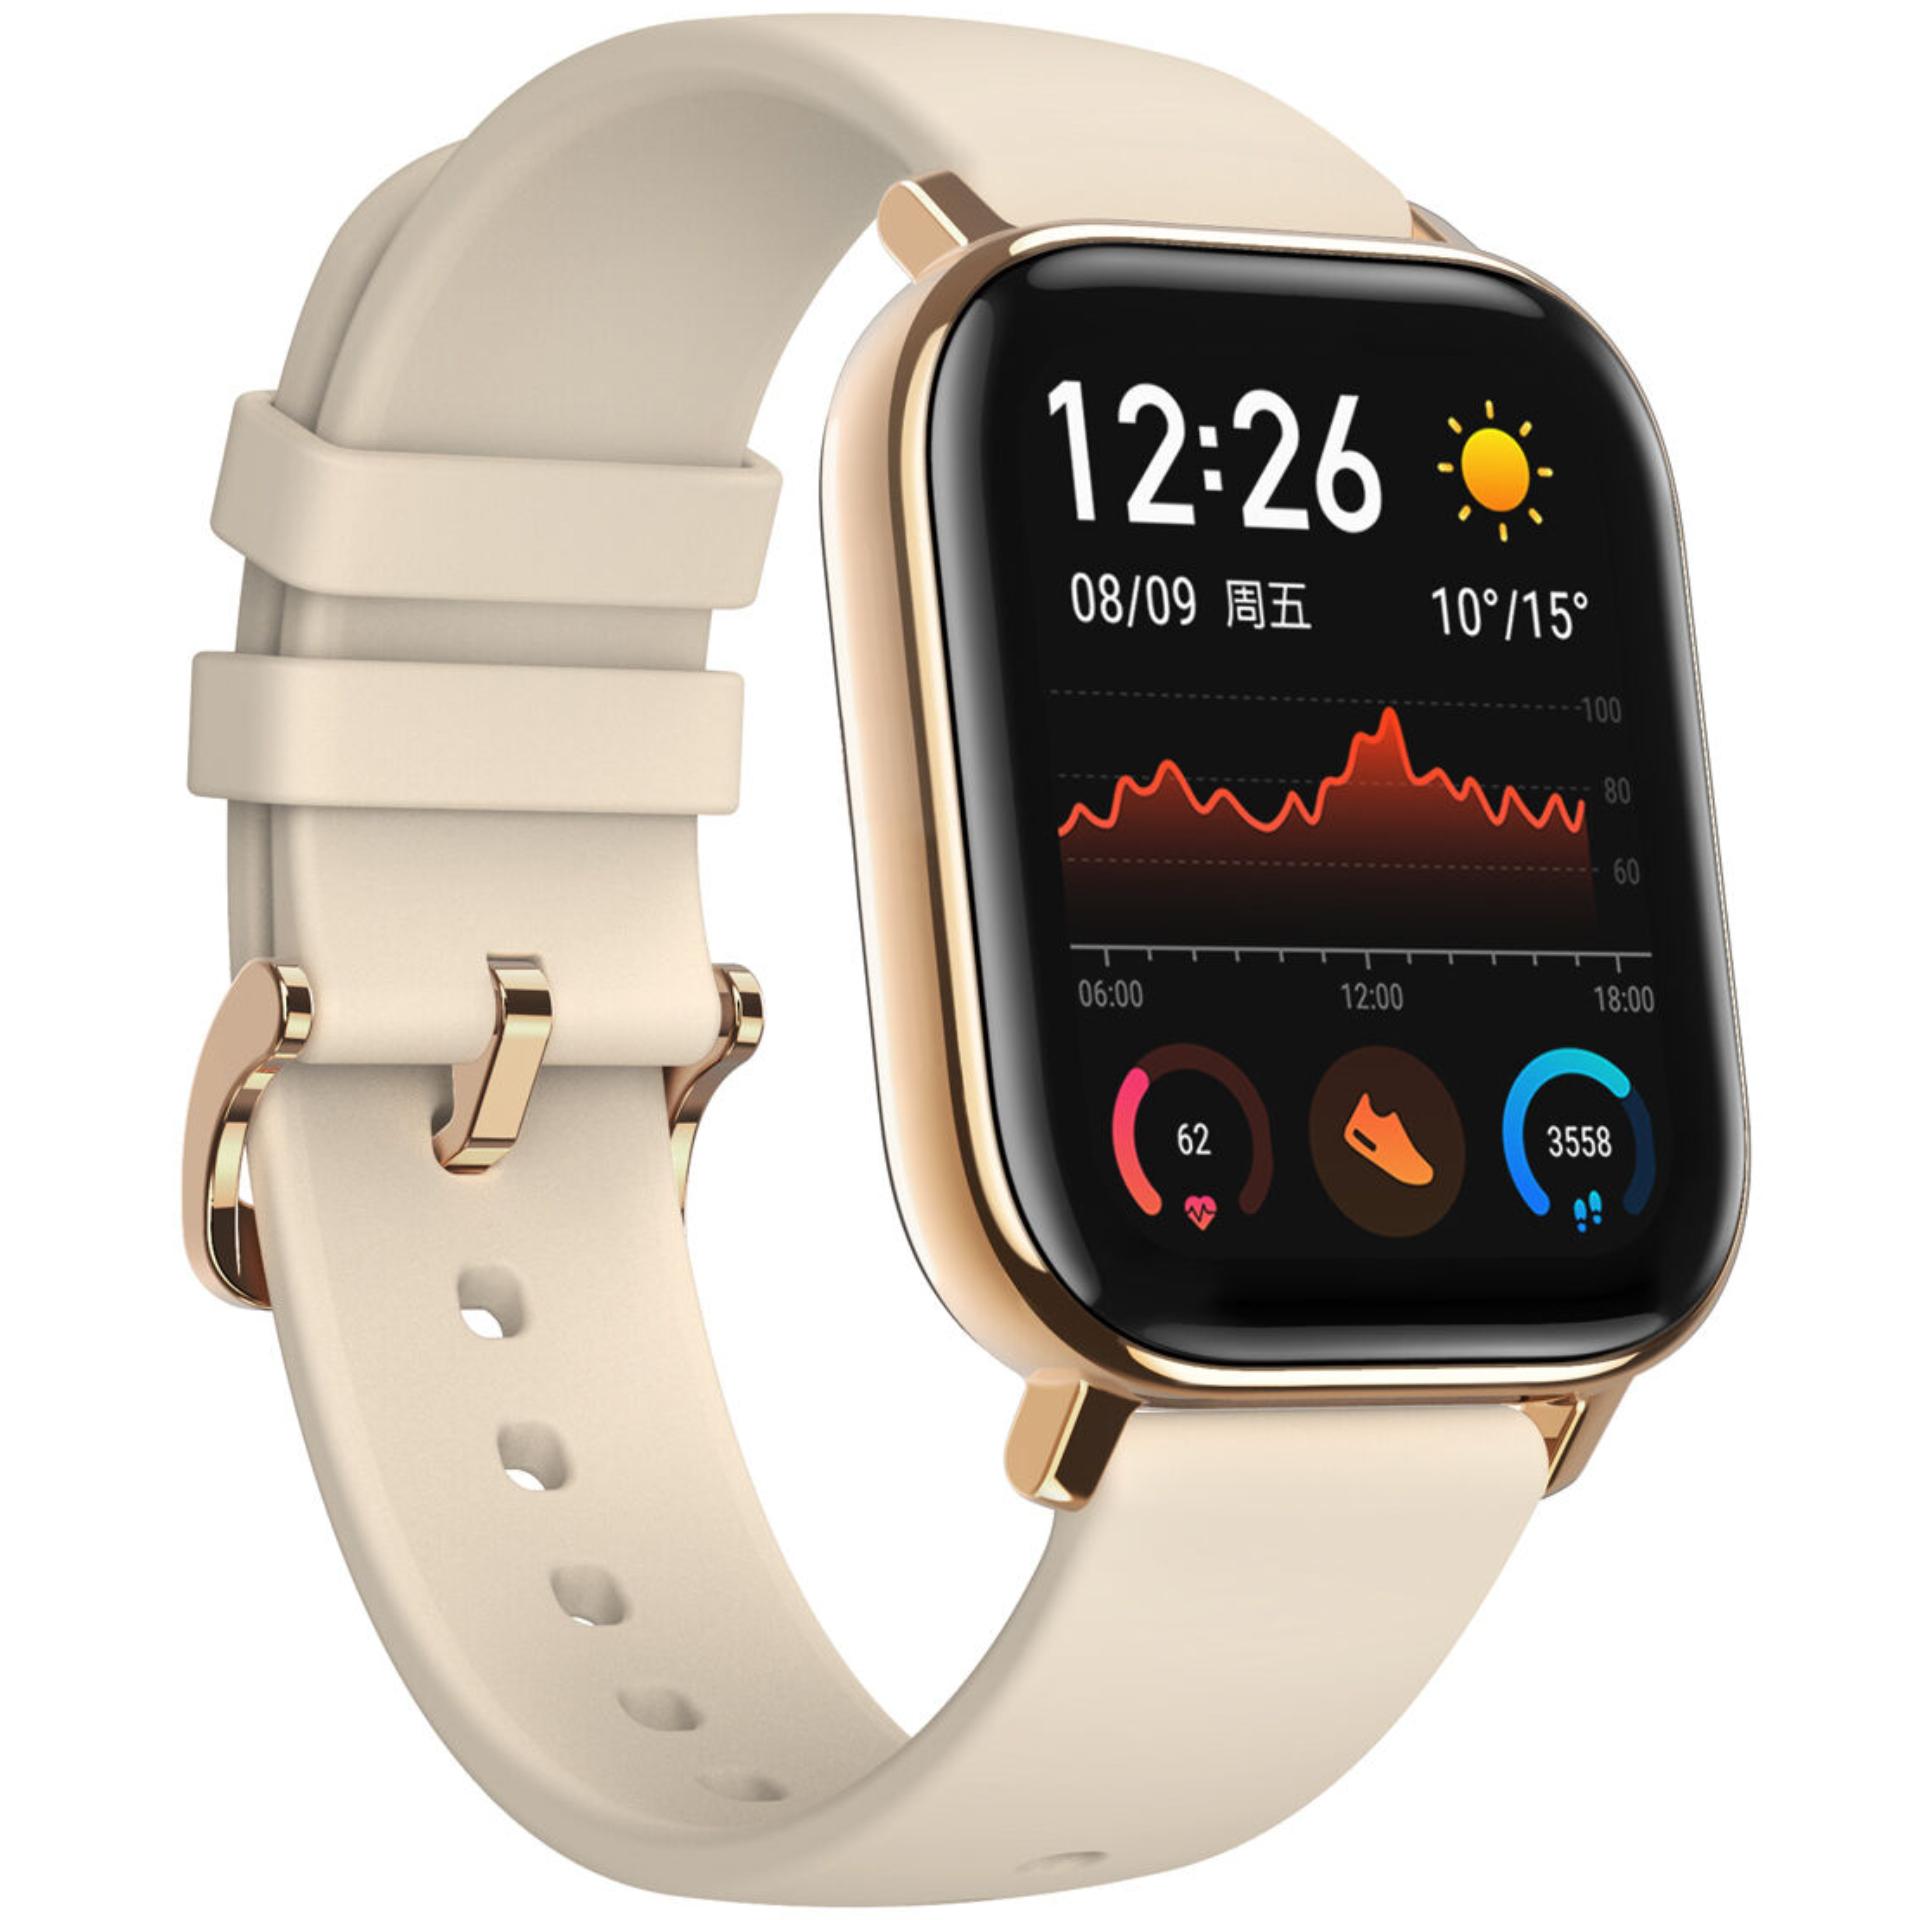 "Amazfit GTS: Smartwatch (1.65"" Amoled Display, 46 Tage Akku, GPS/Glonass, Herzfrequenzsensor, 6-Achsen-Sensor, BioTracker, 5ATM Wasserdicht)"